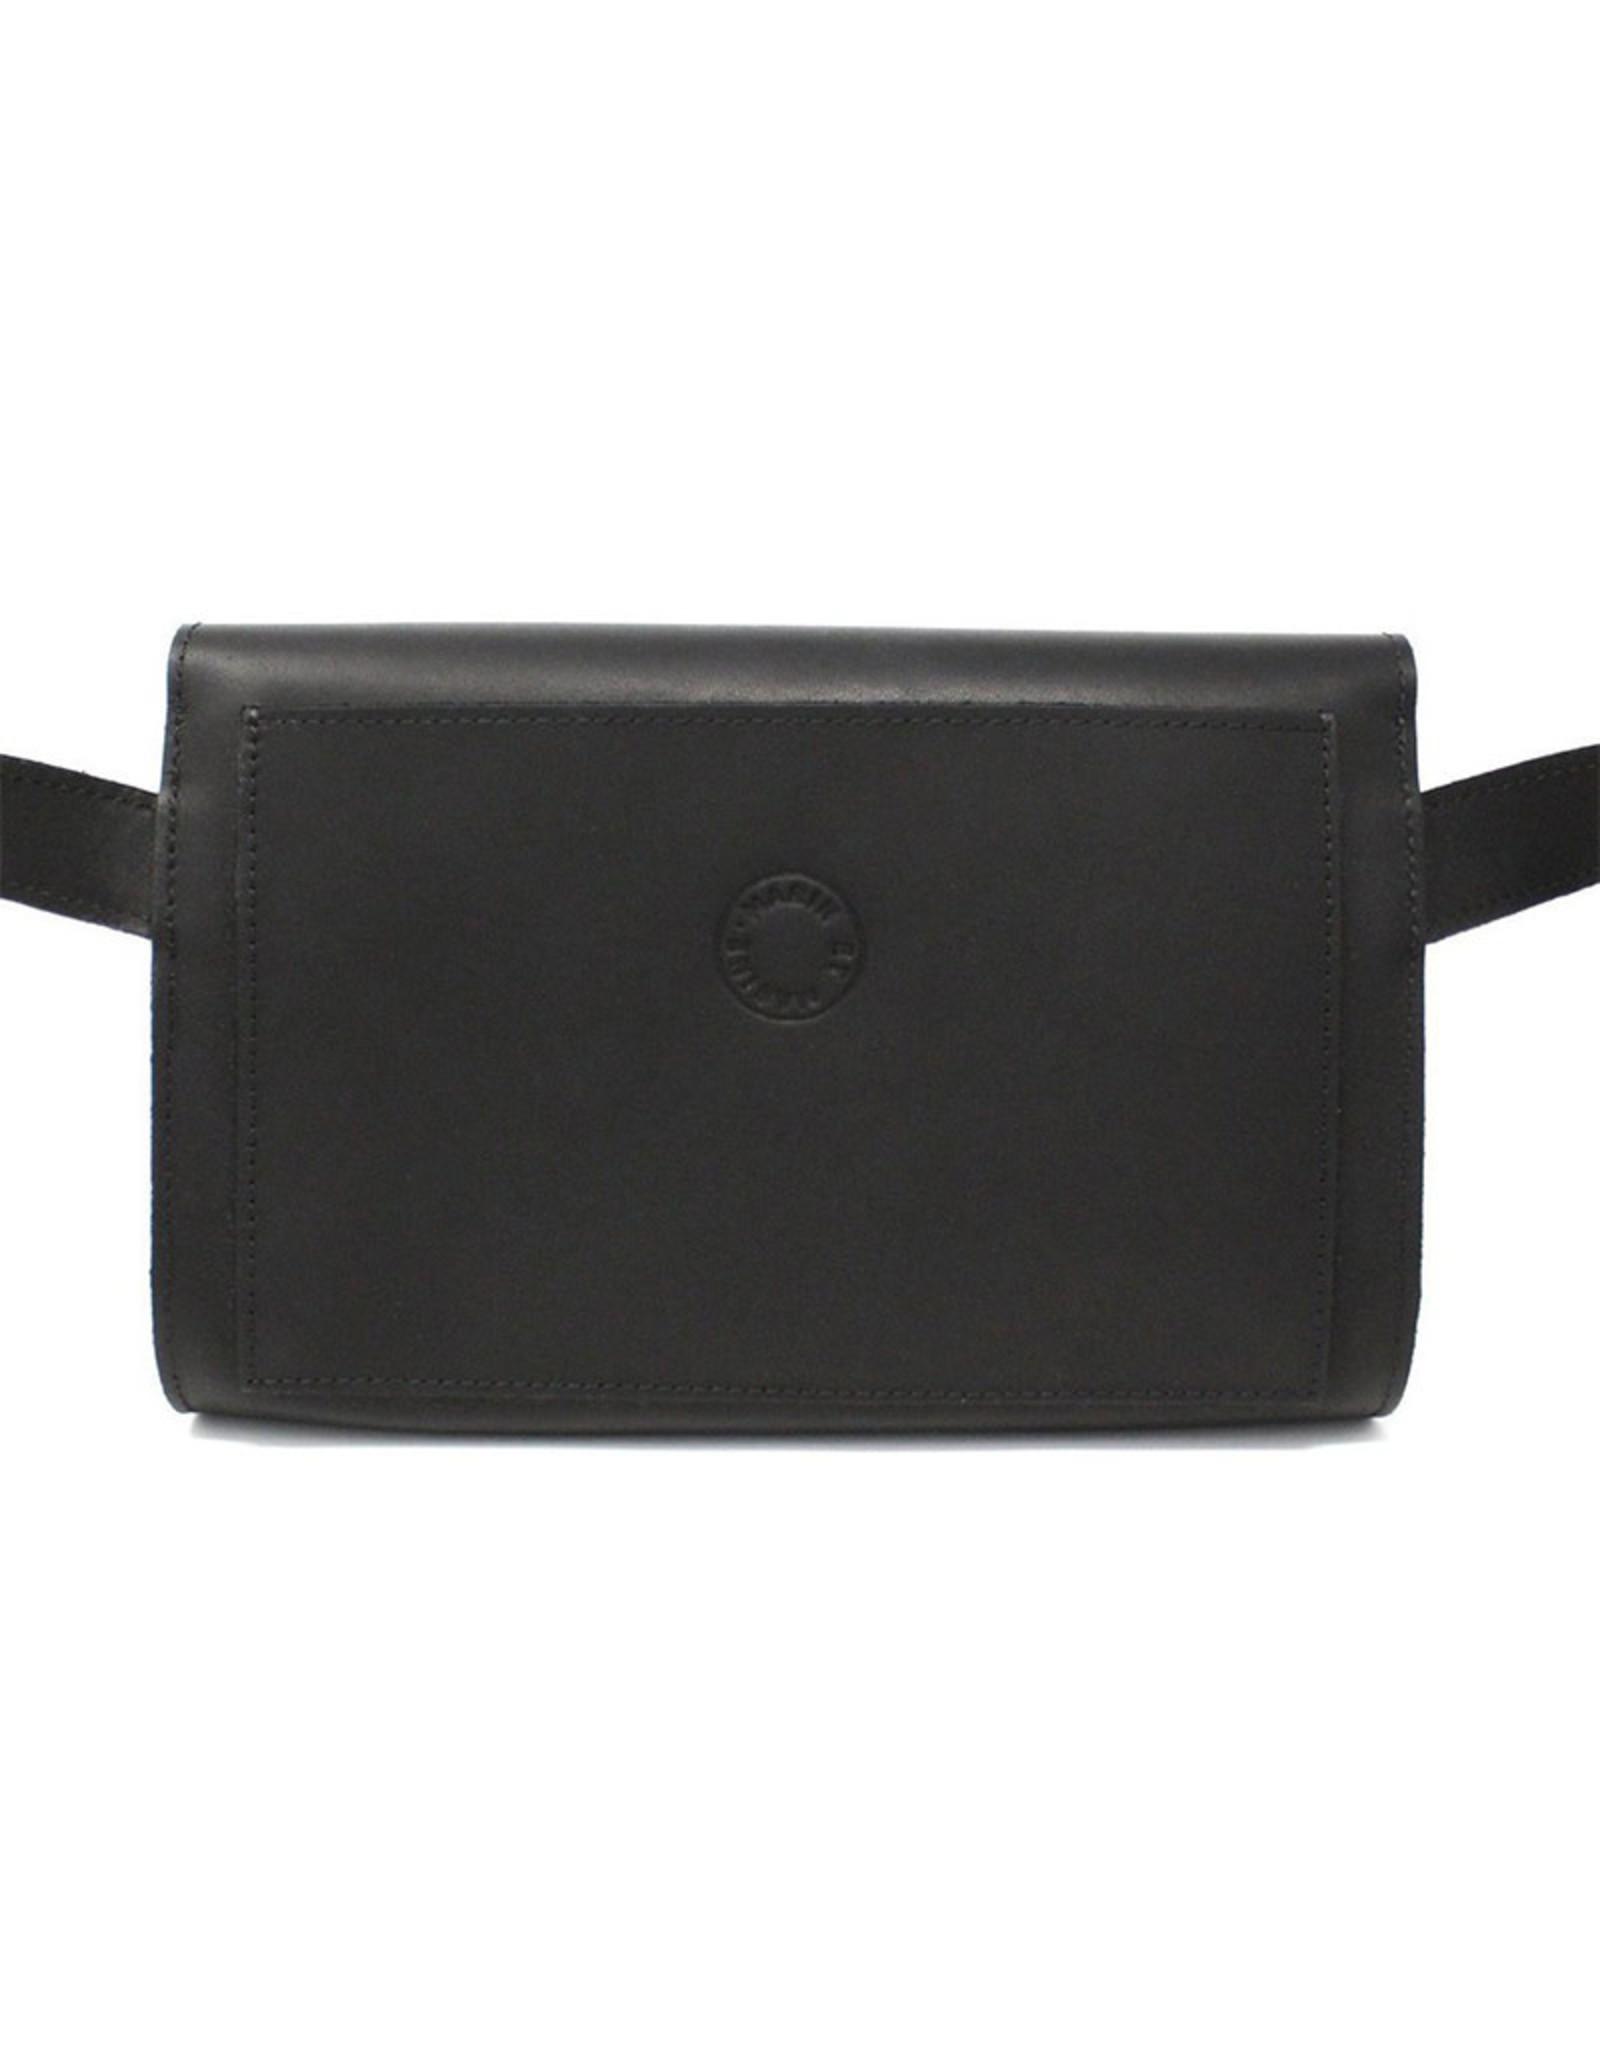 Marin Et Marine Paris Bag - Preorder